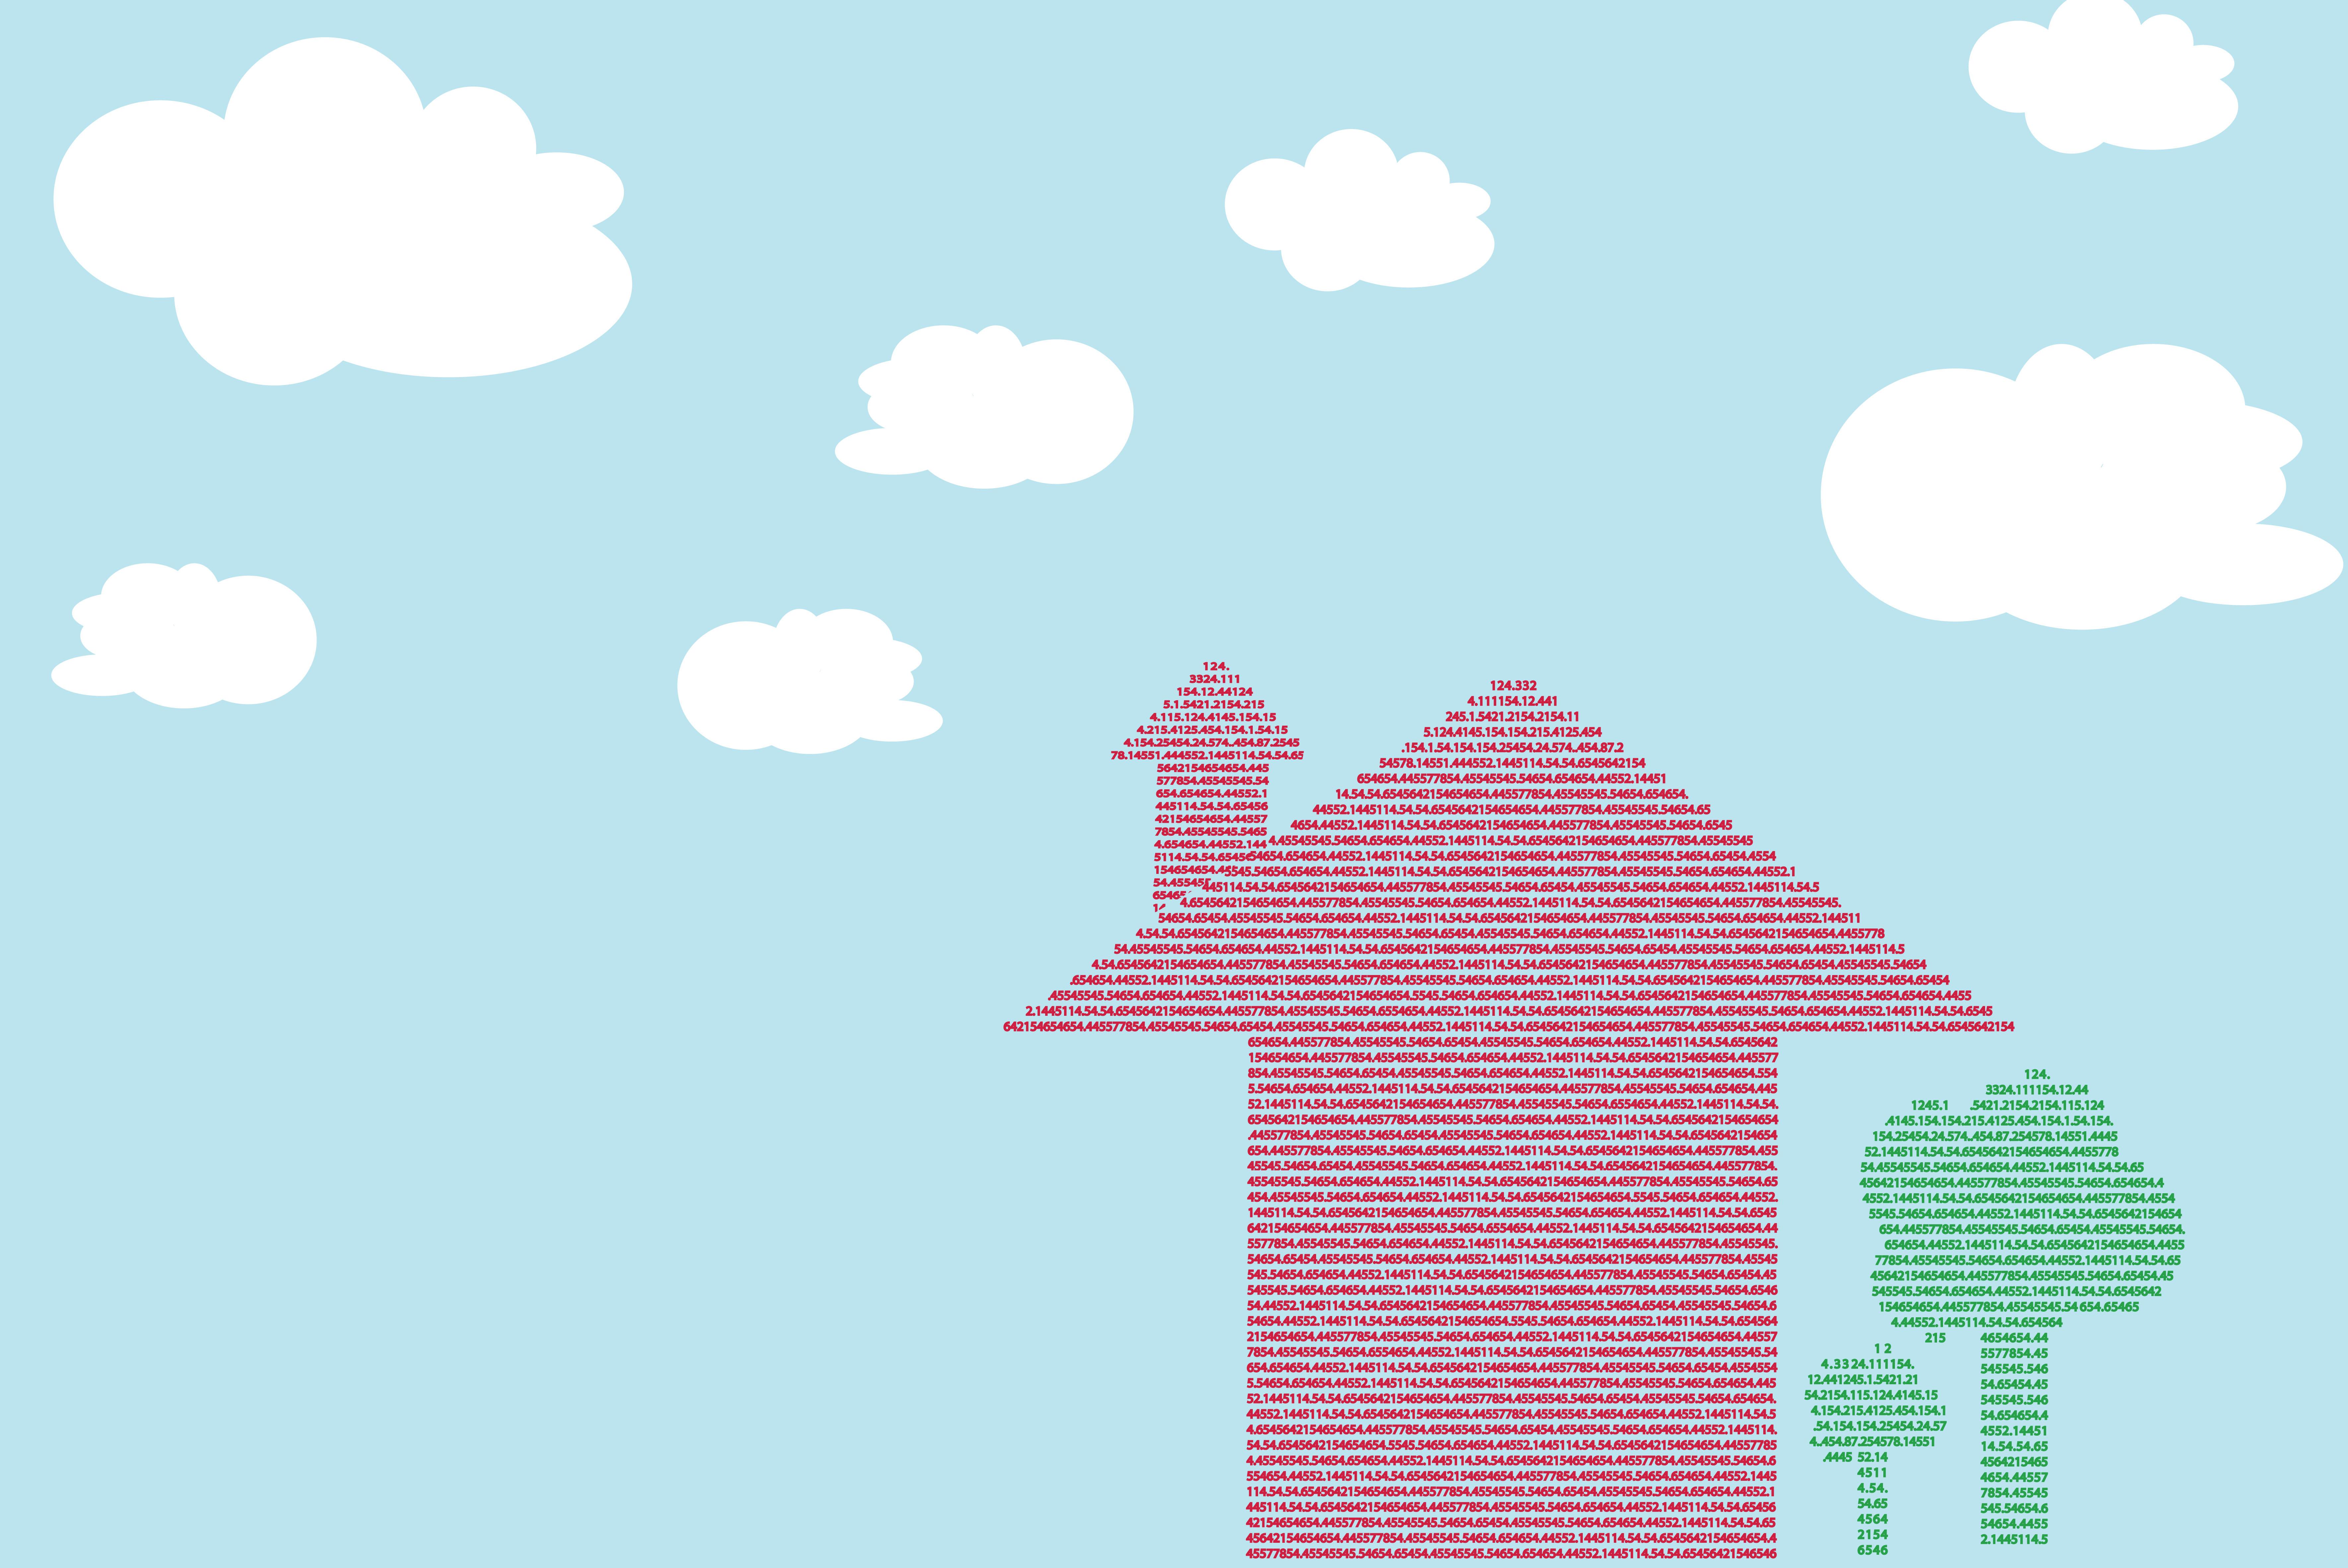 Revealed: the UK's top 20 property hotspots